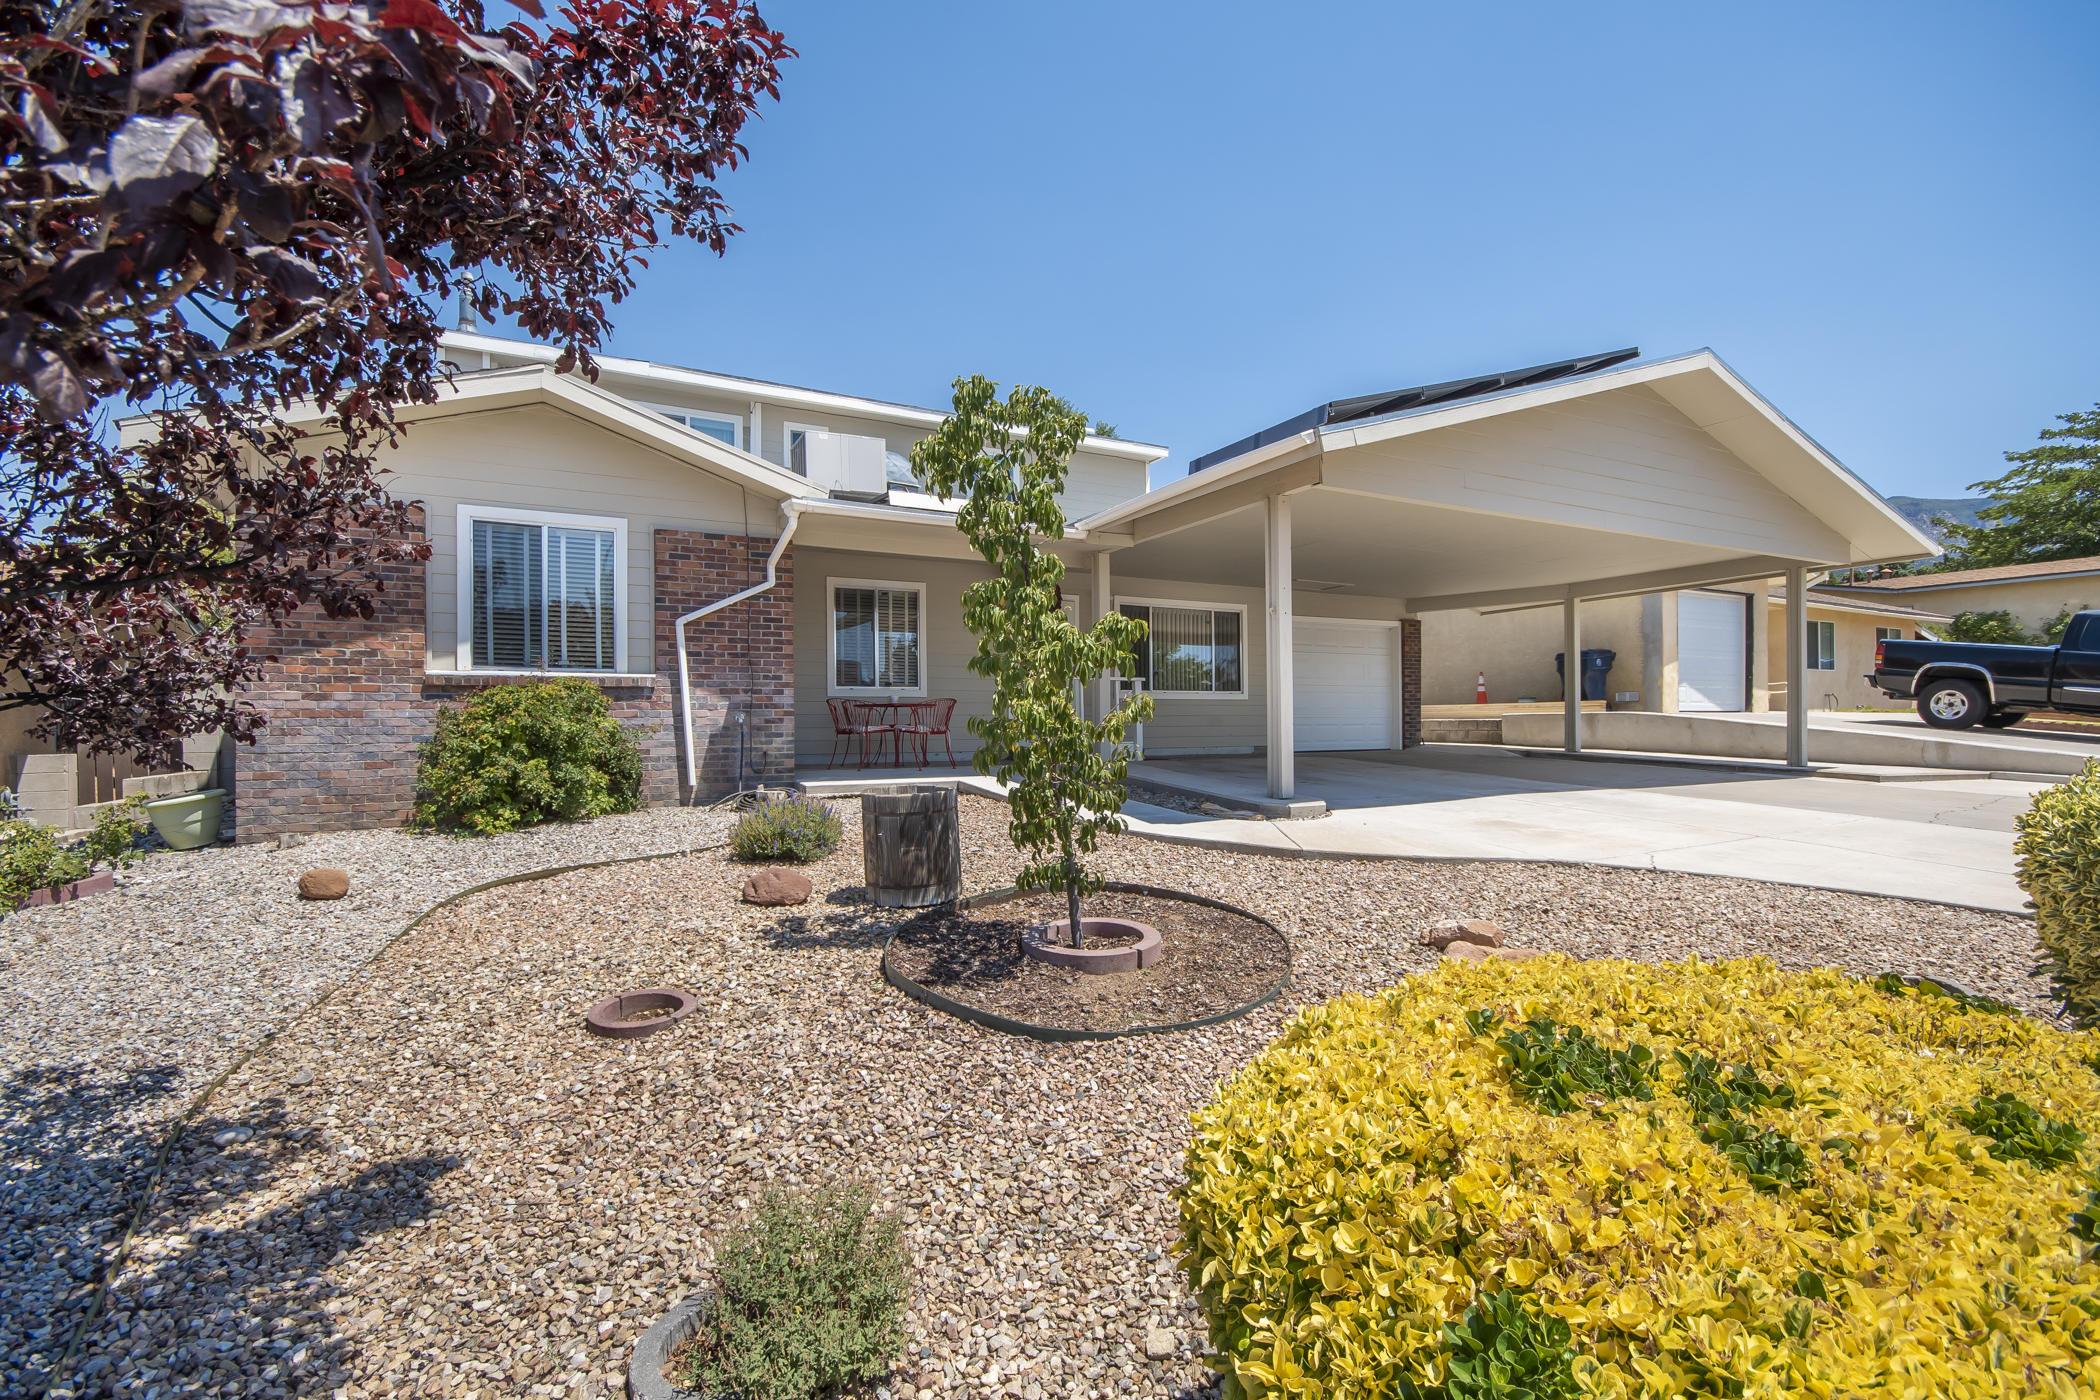 13509 PIERCE ARROW Road NE Property Photo - Albuquerque, NM real estate listing